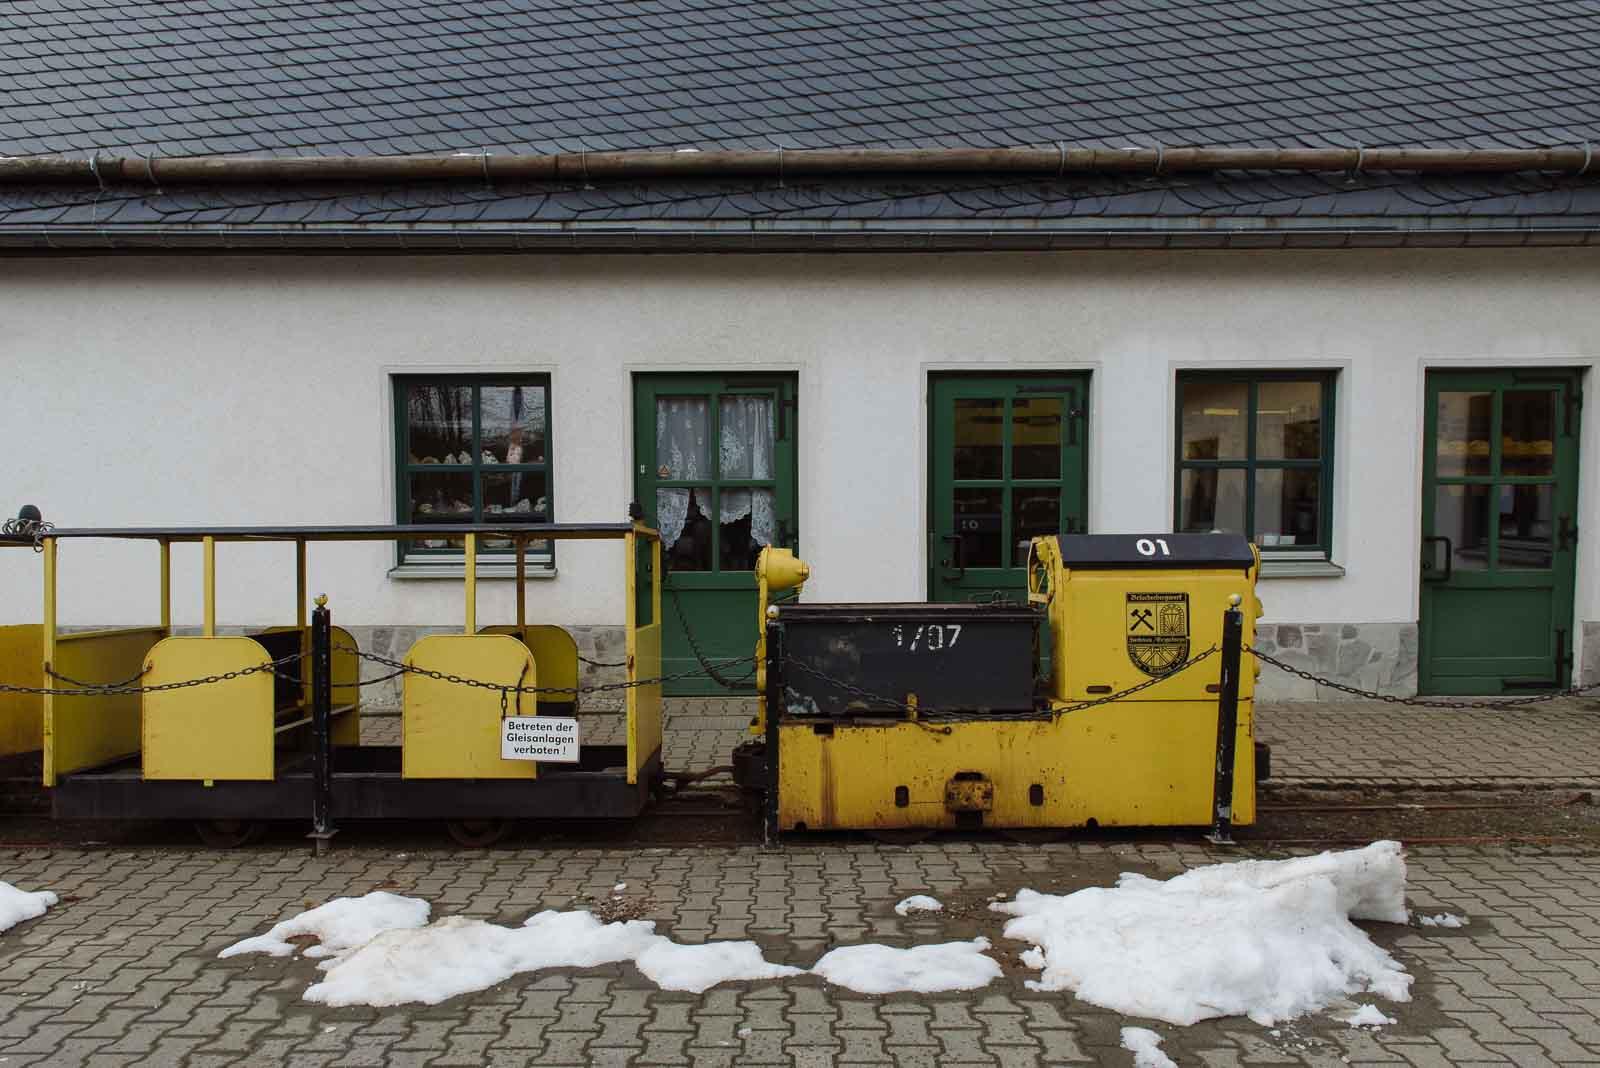 Grubenbahn Markus-Röhling-Stolln Erzgebirge